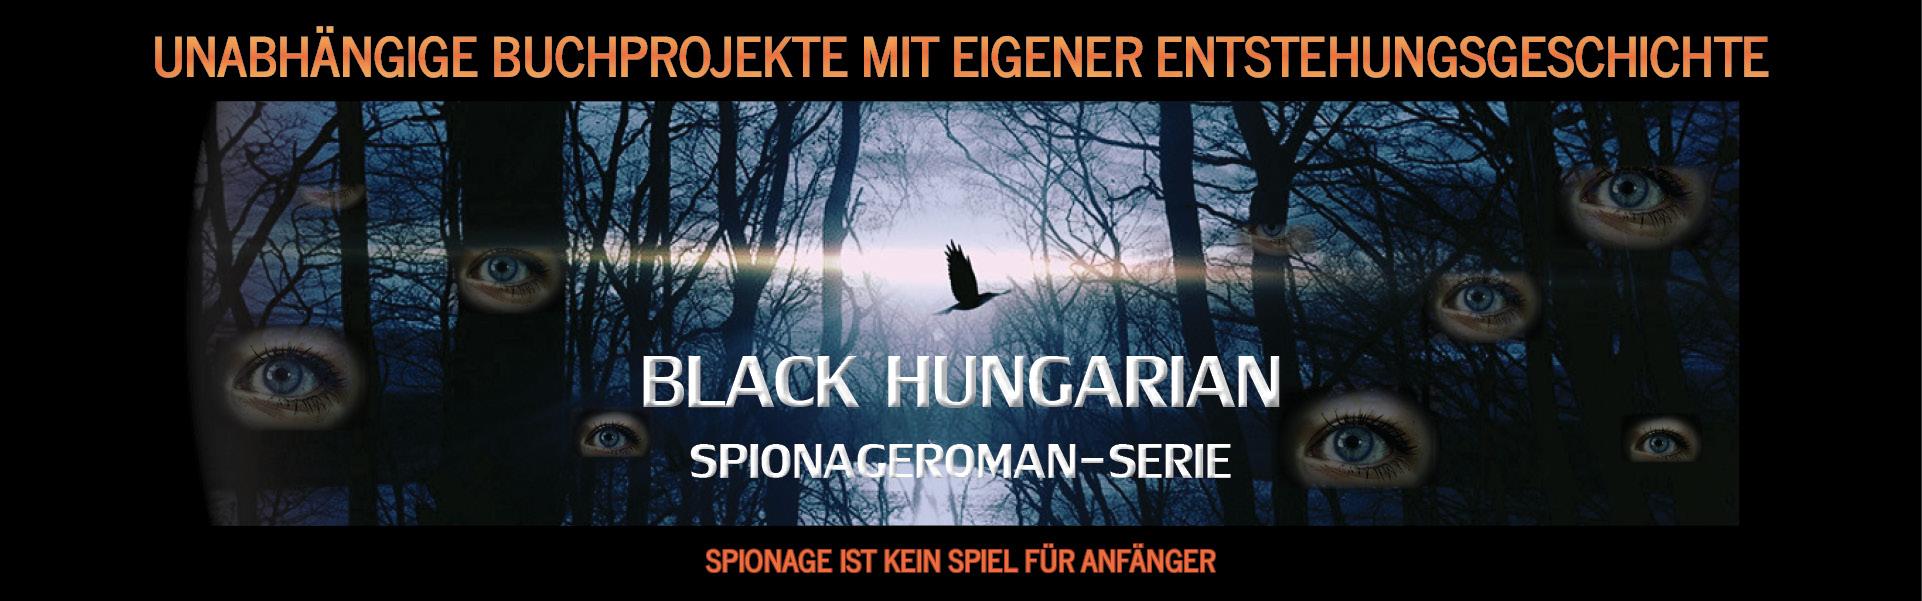 Spionageroman Serie Projekt Black Hungarian